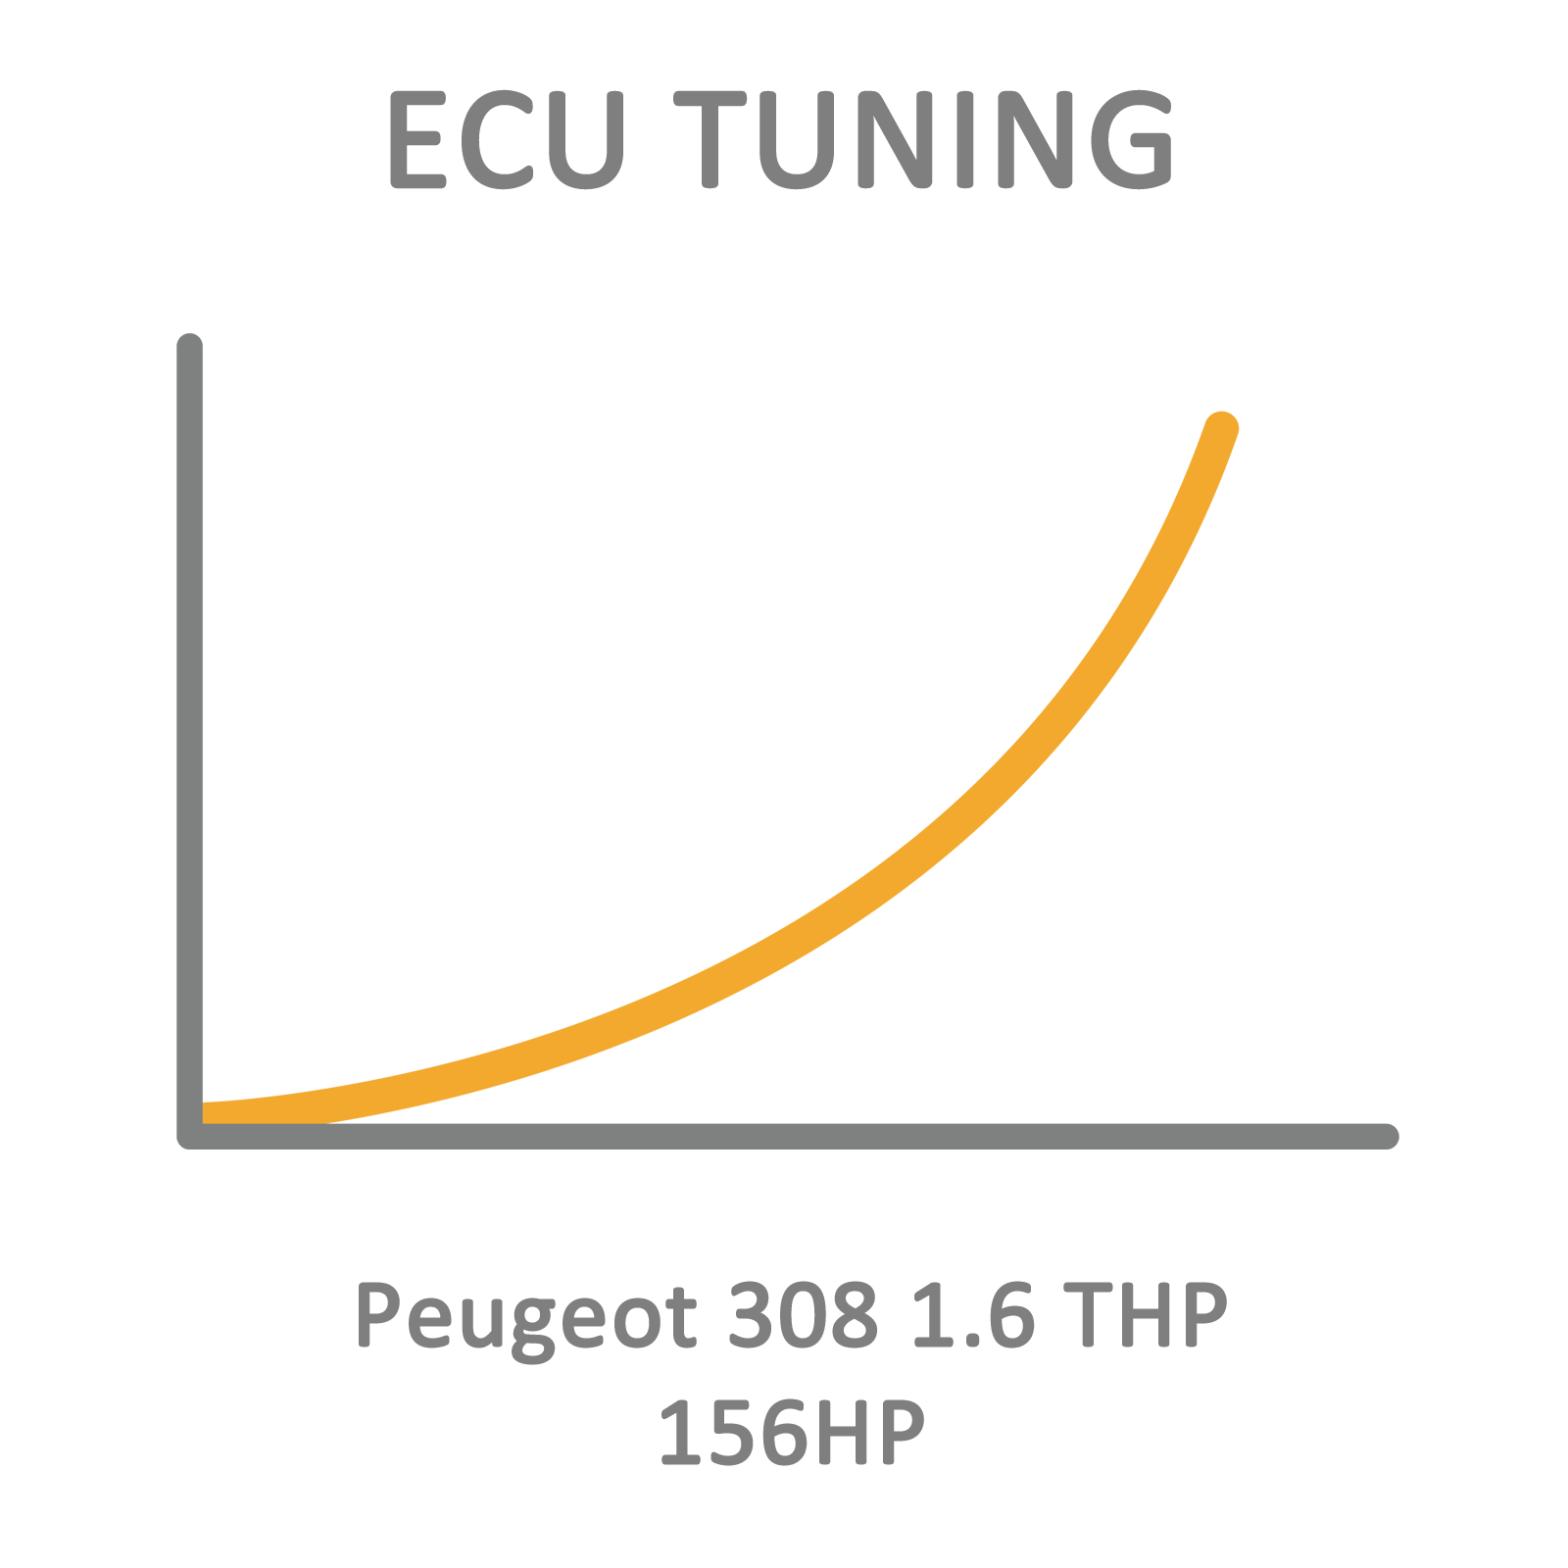 Peugeot 308 1.6 THP 156HP ECU Tuning Remapping Programming